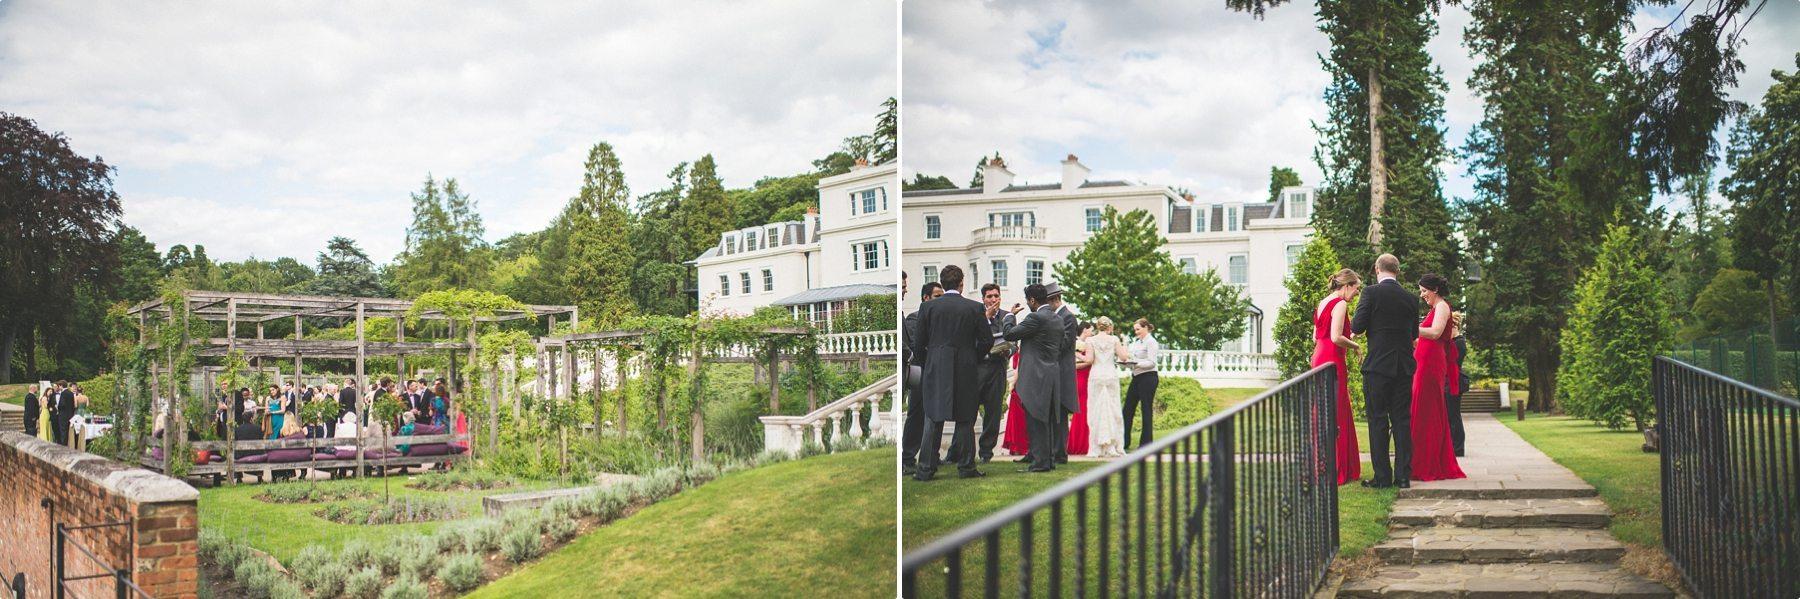 Coworth Park Barn summer wedding photography